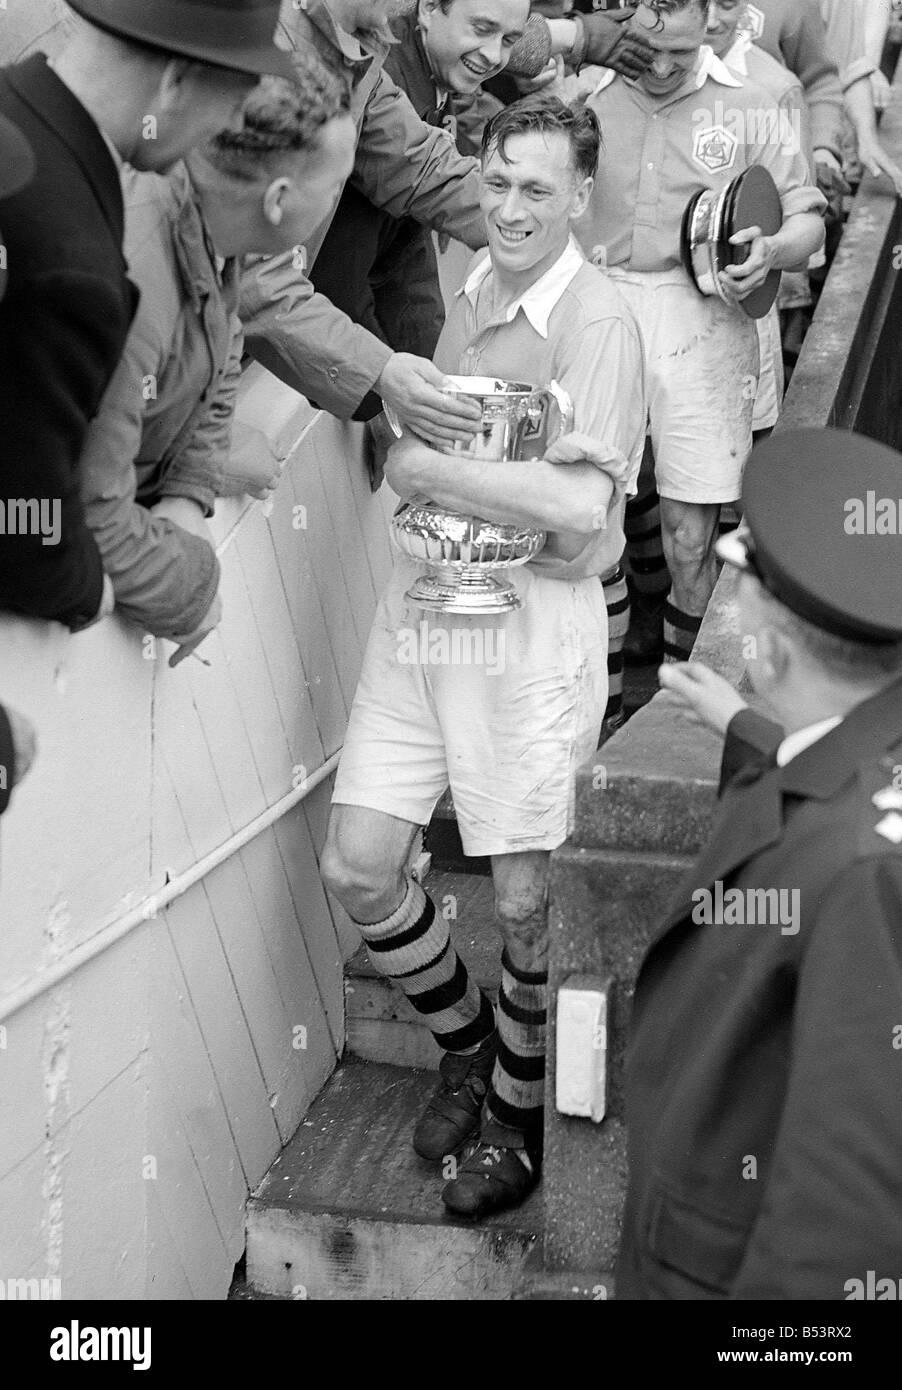 DM 023836 12 1950 Joe Mercer Wembley Stadium - Stock Image